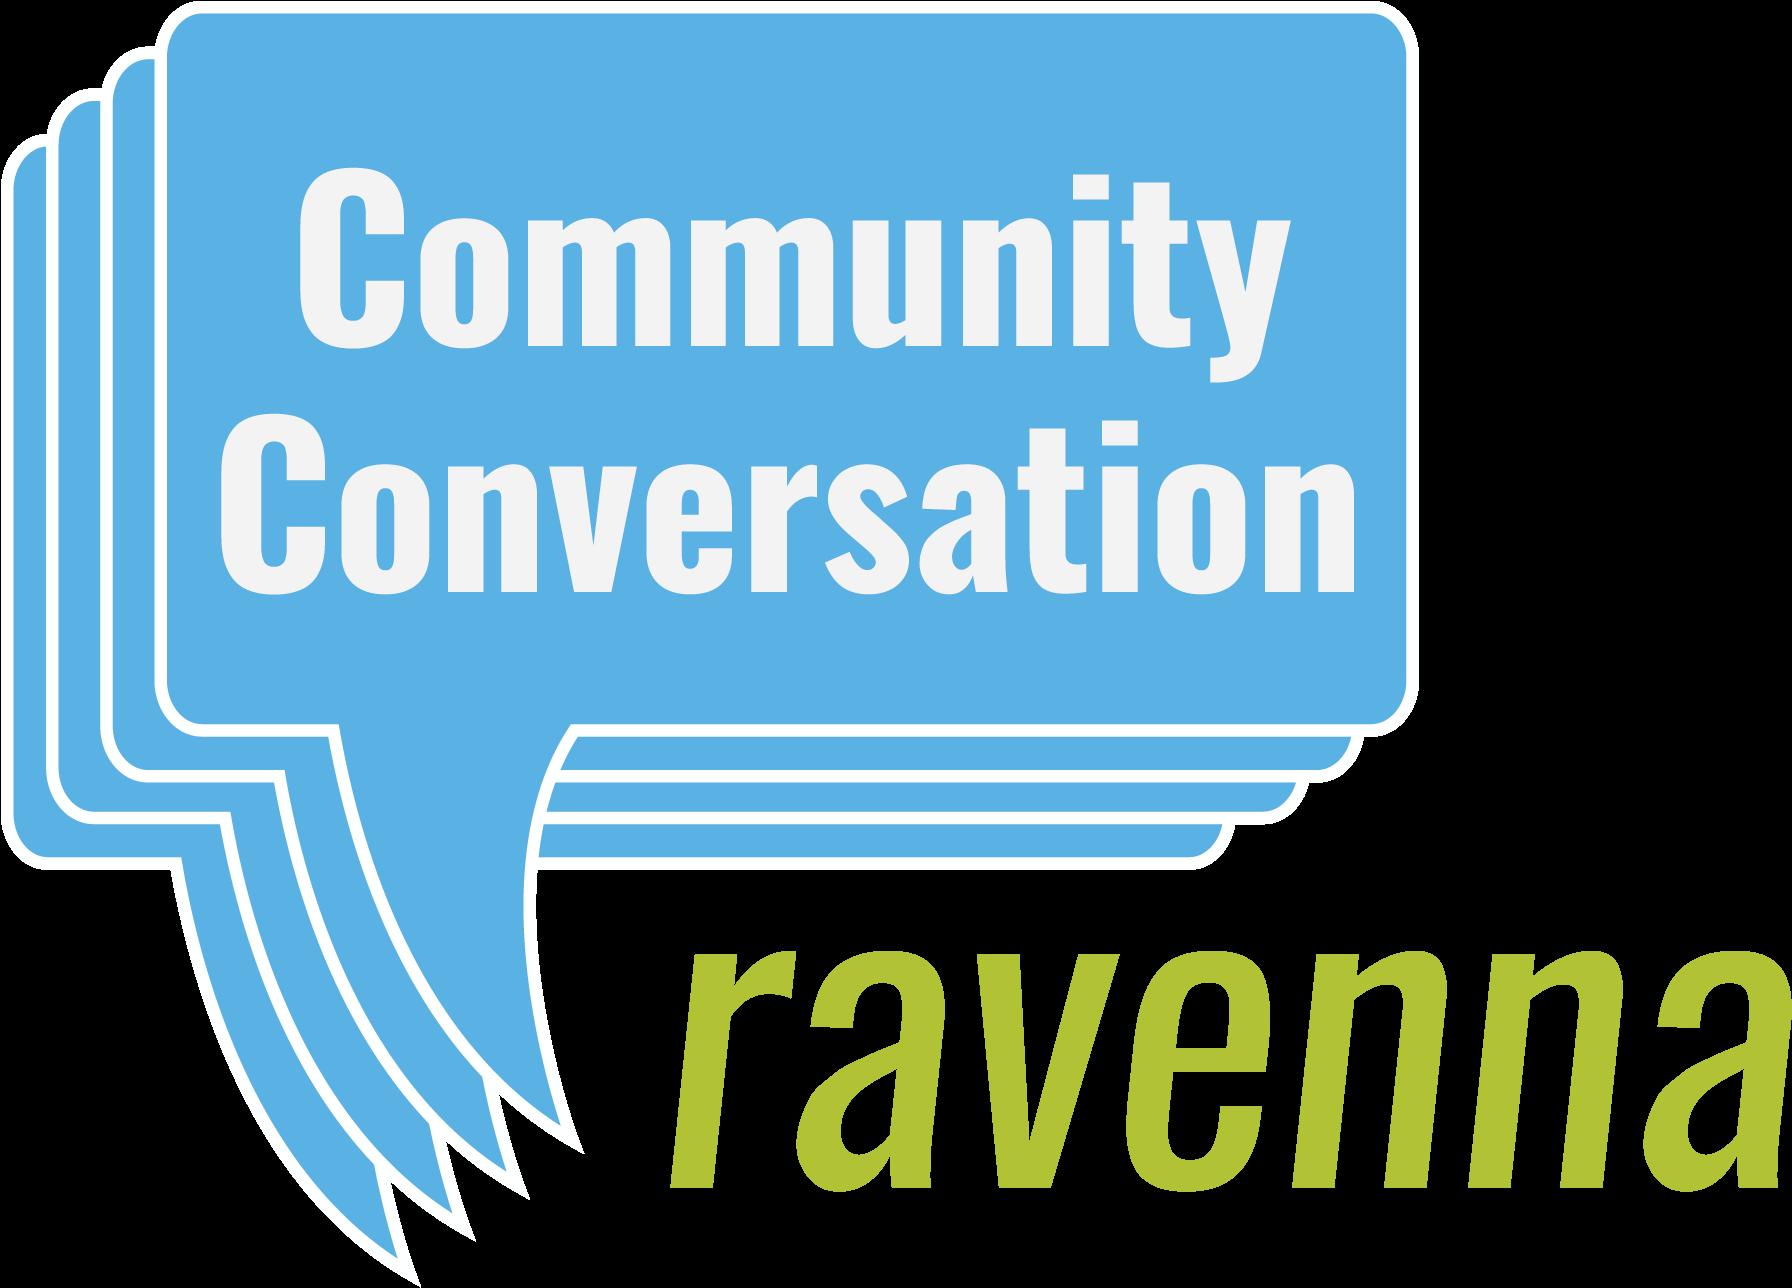 Community Conversation Ravenna Is A One Of A Kind Initiative - Open De España (1802x1305), Png Download